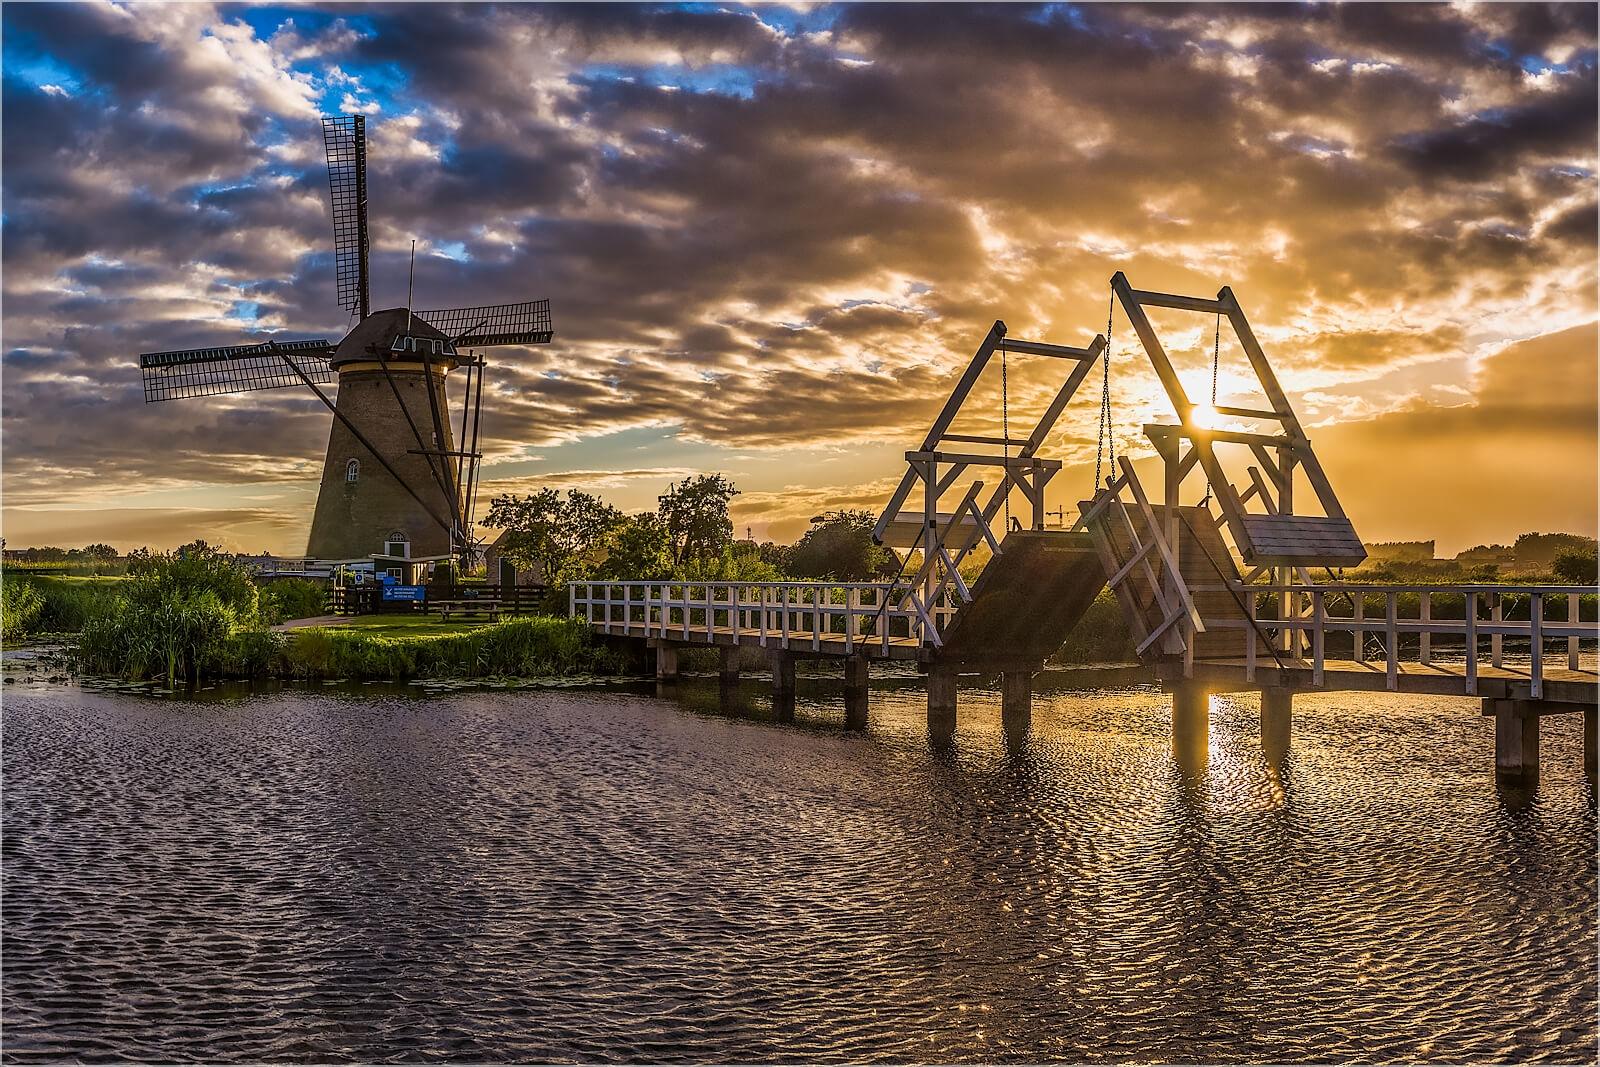 Wandbild Sonnenuntergang in Kinderdijk Holland